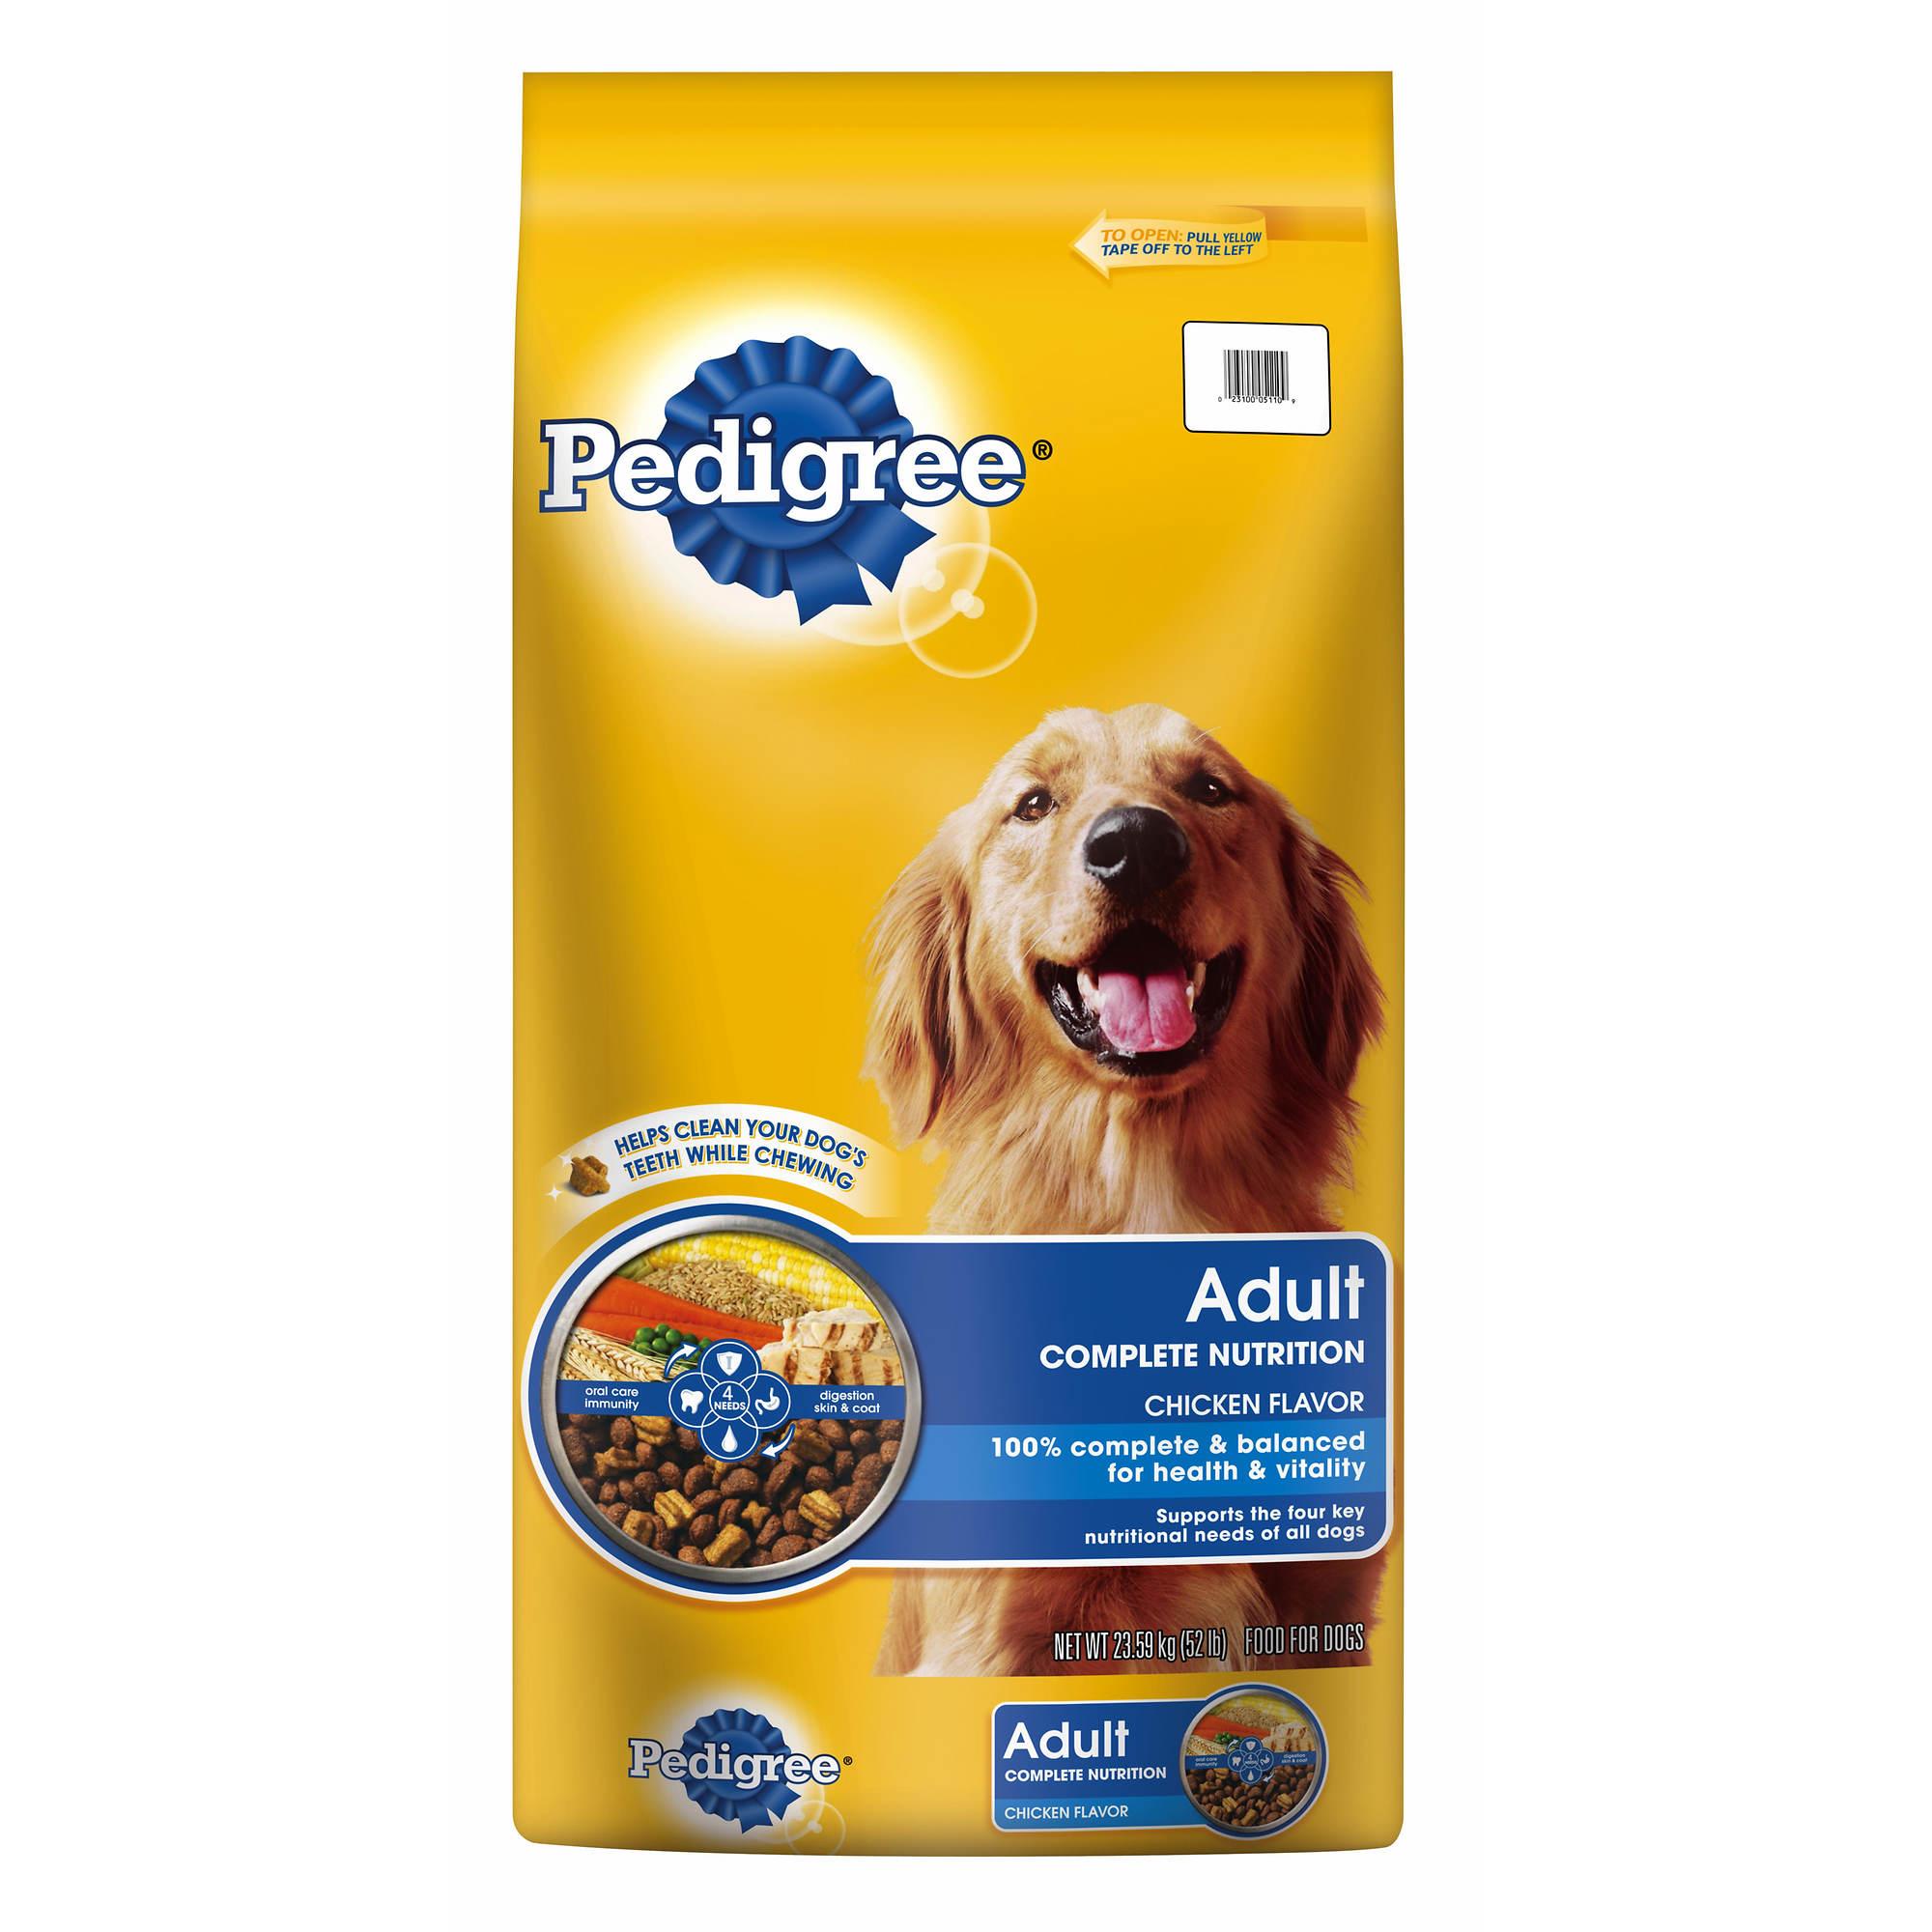 Pedigree Dog Food Online Coupons